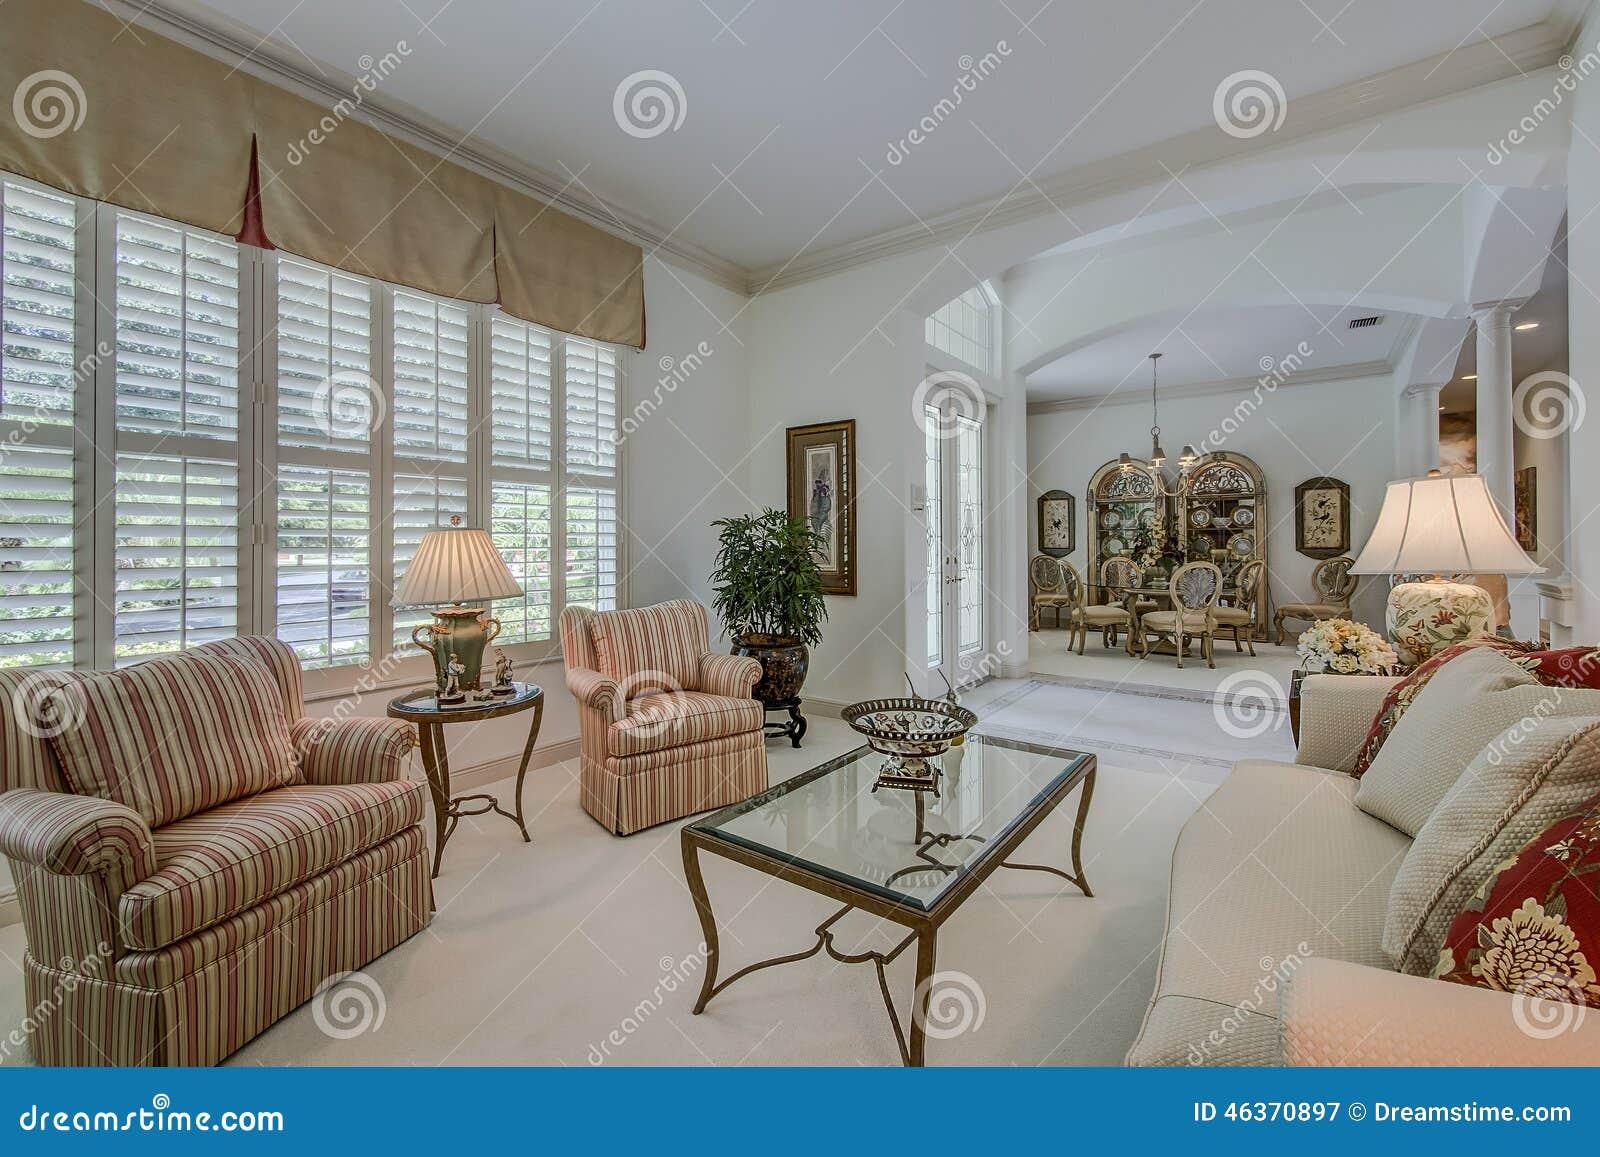 Florida luxury home living room